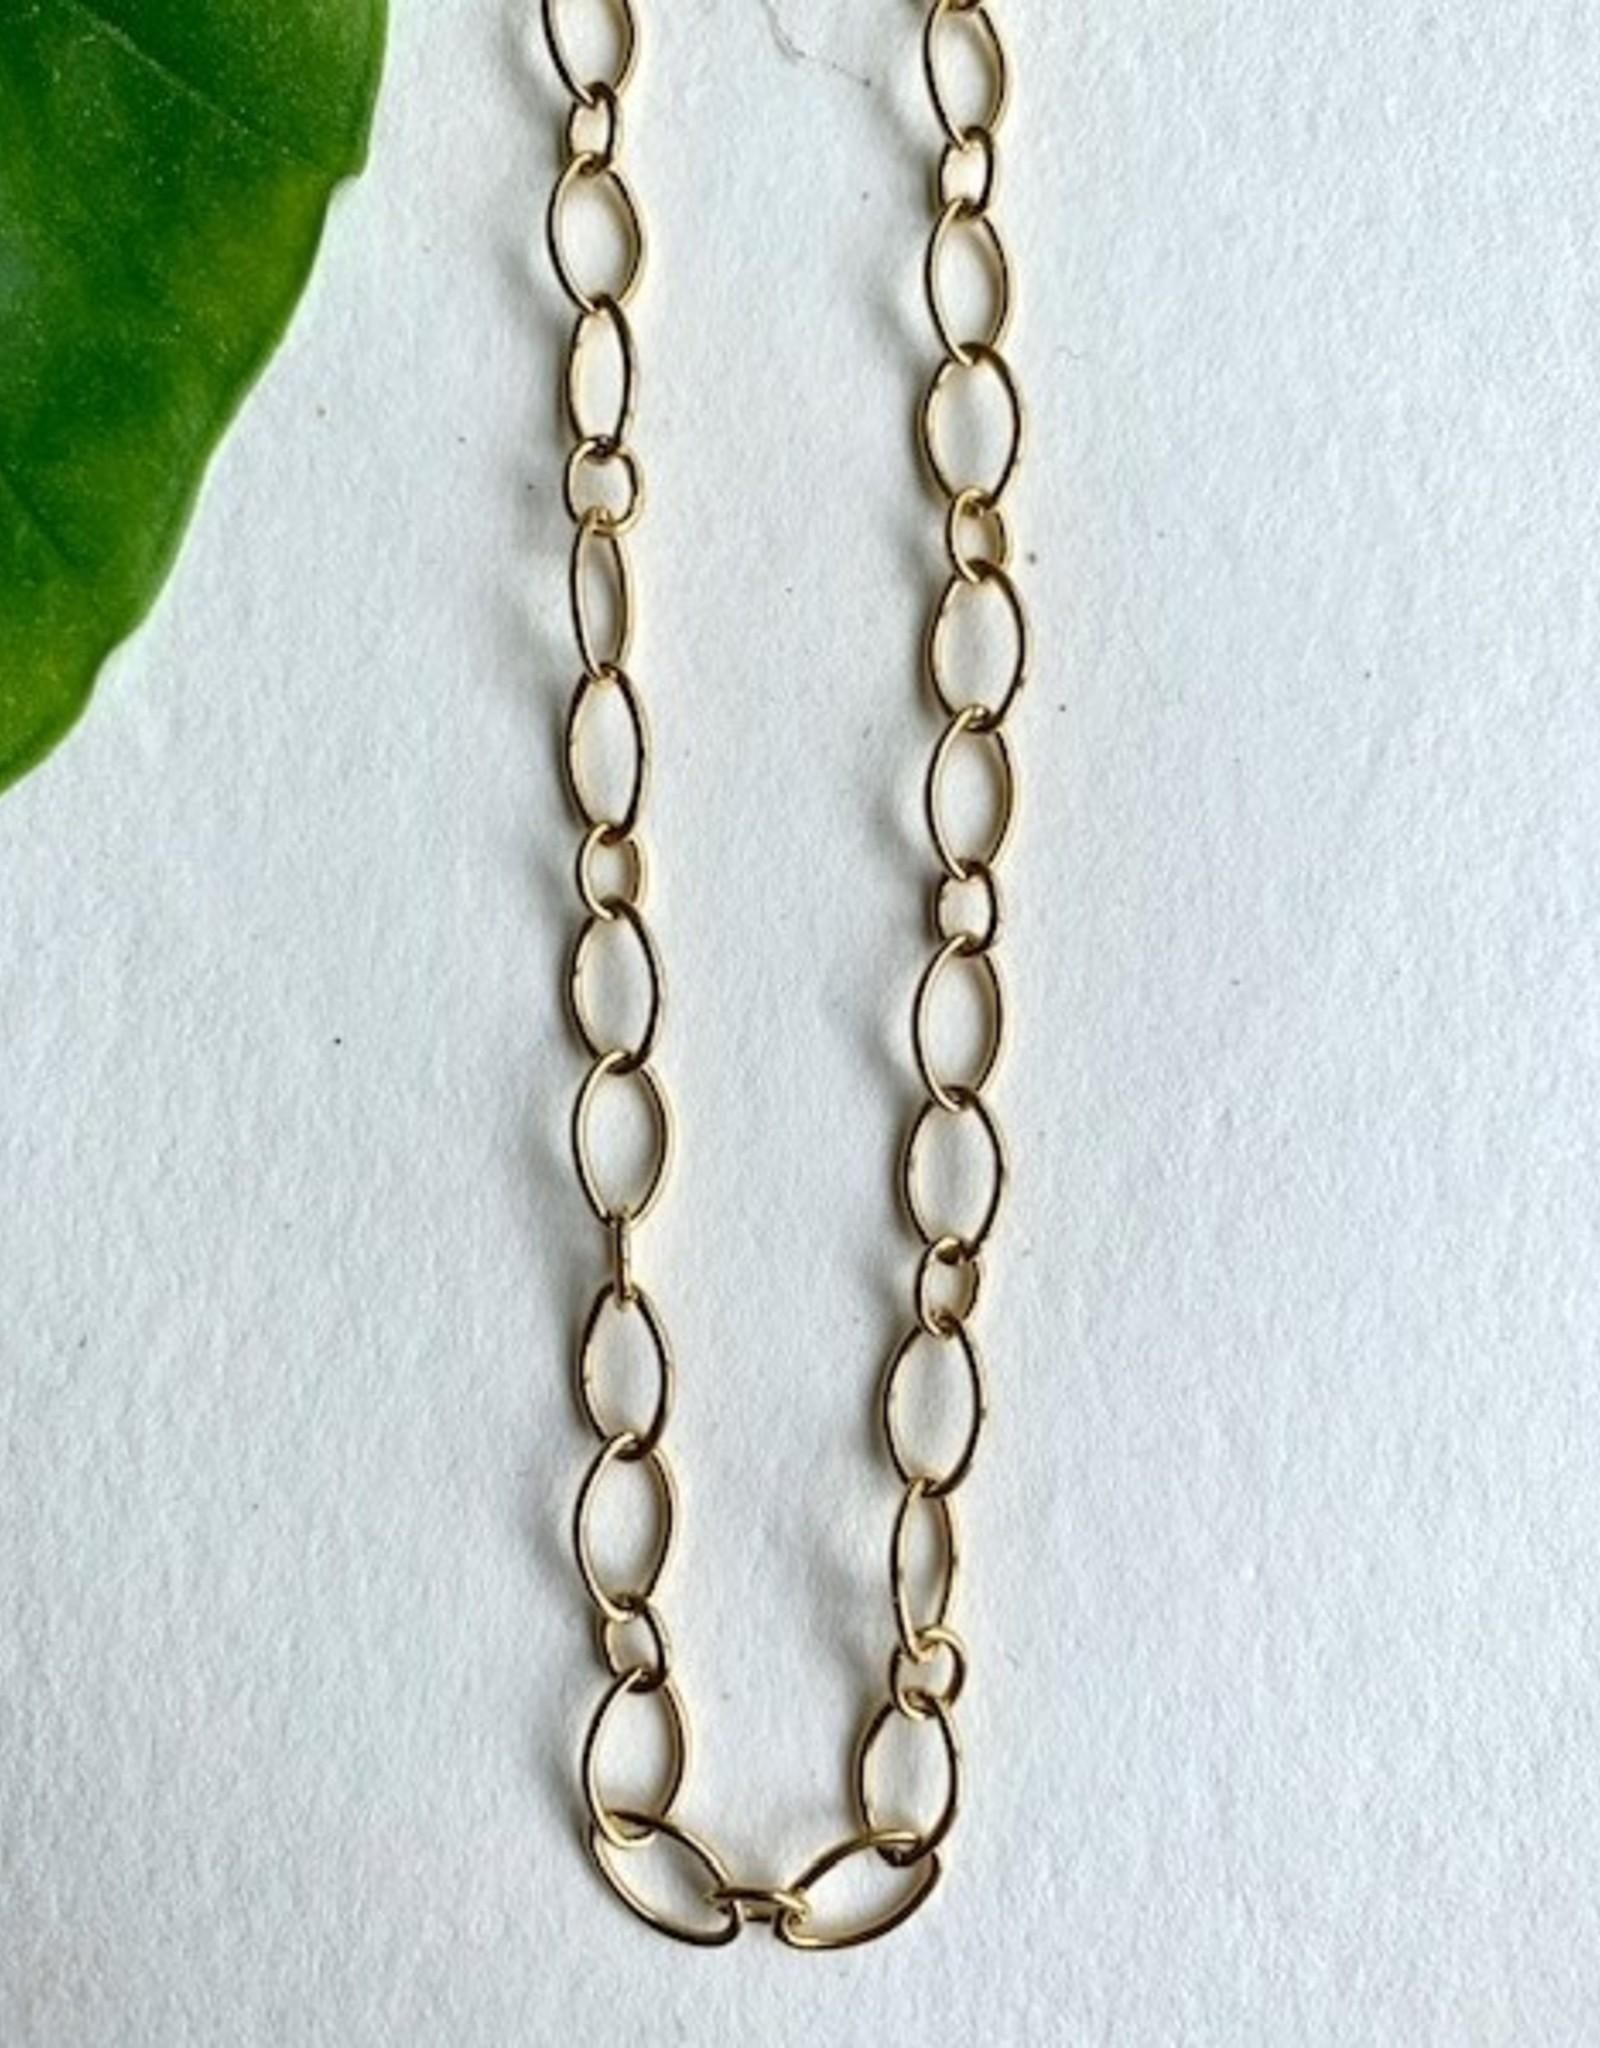 Vintage Chain